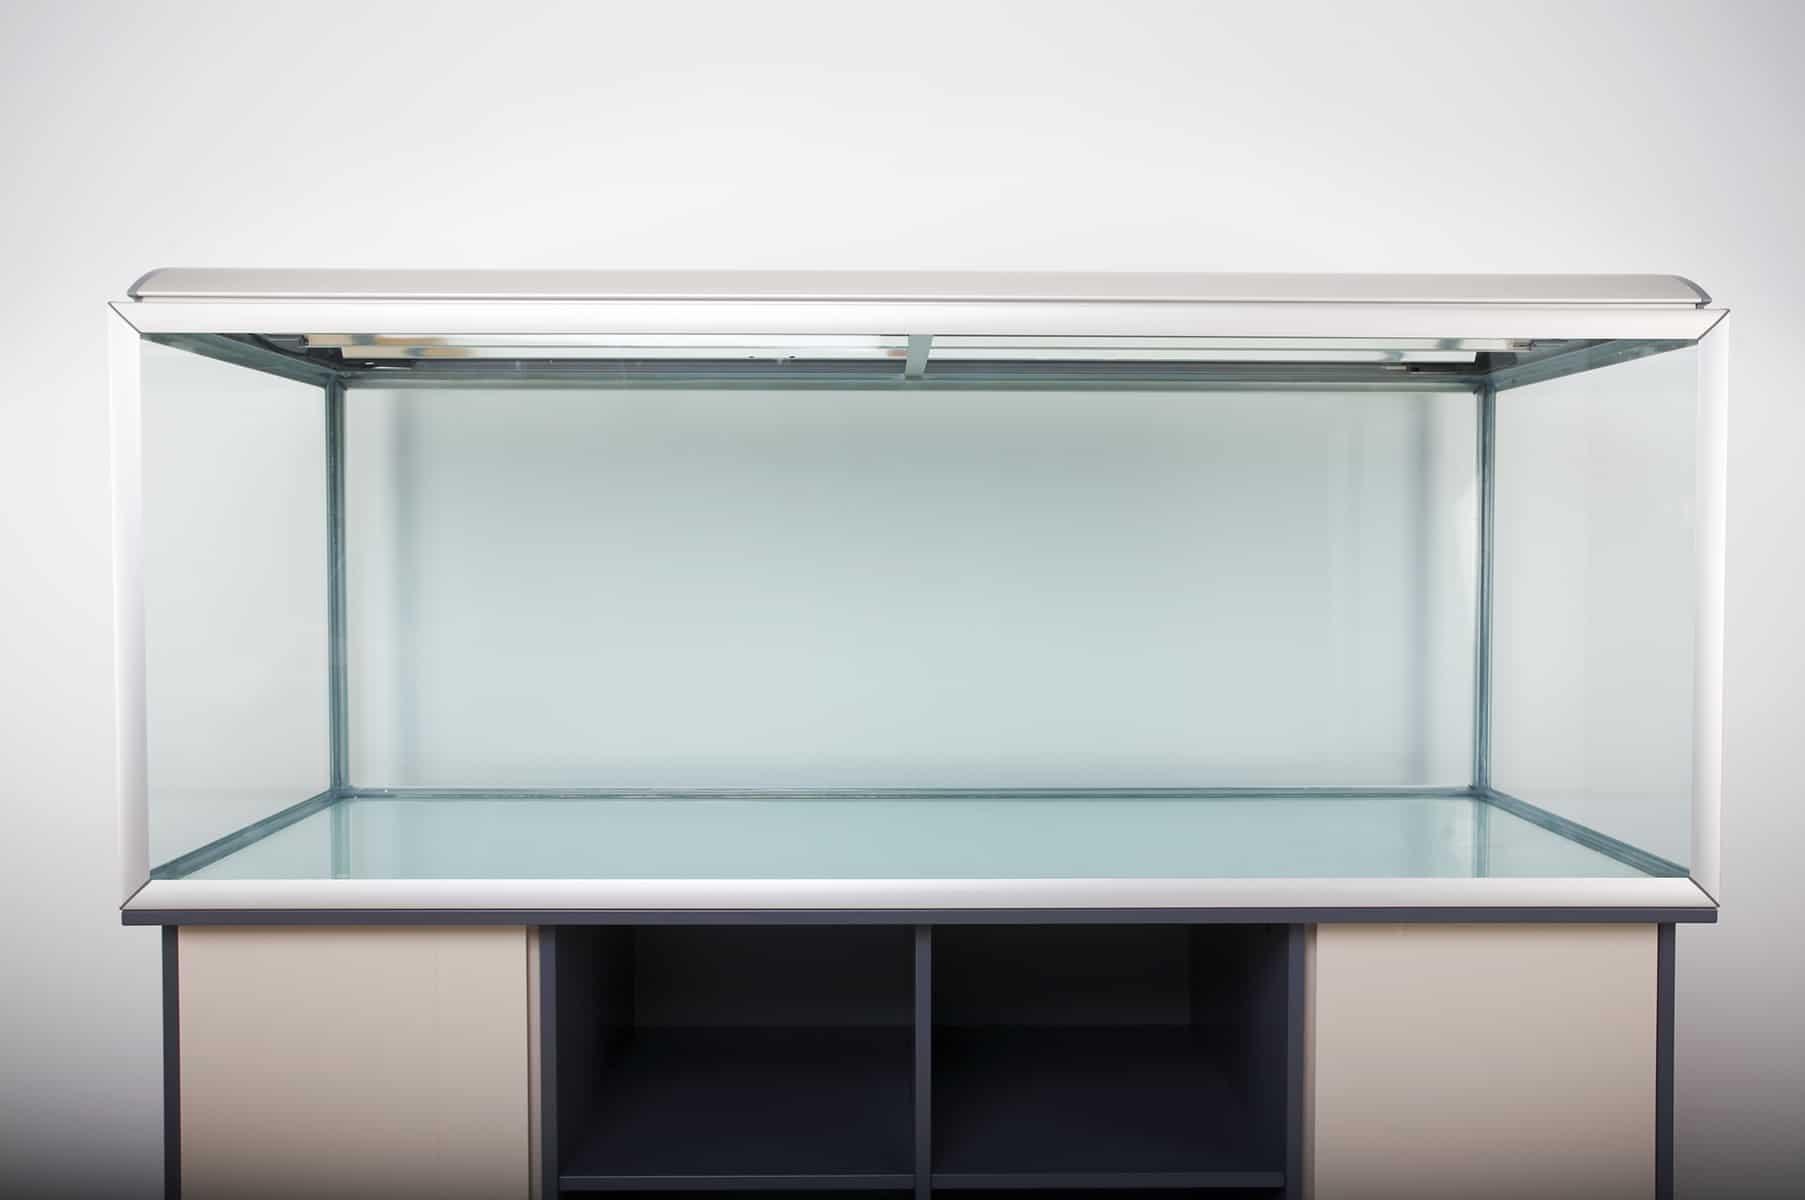 acquario-piranha-allestimento-i-primi-passi-5